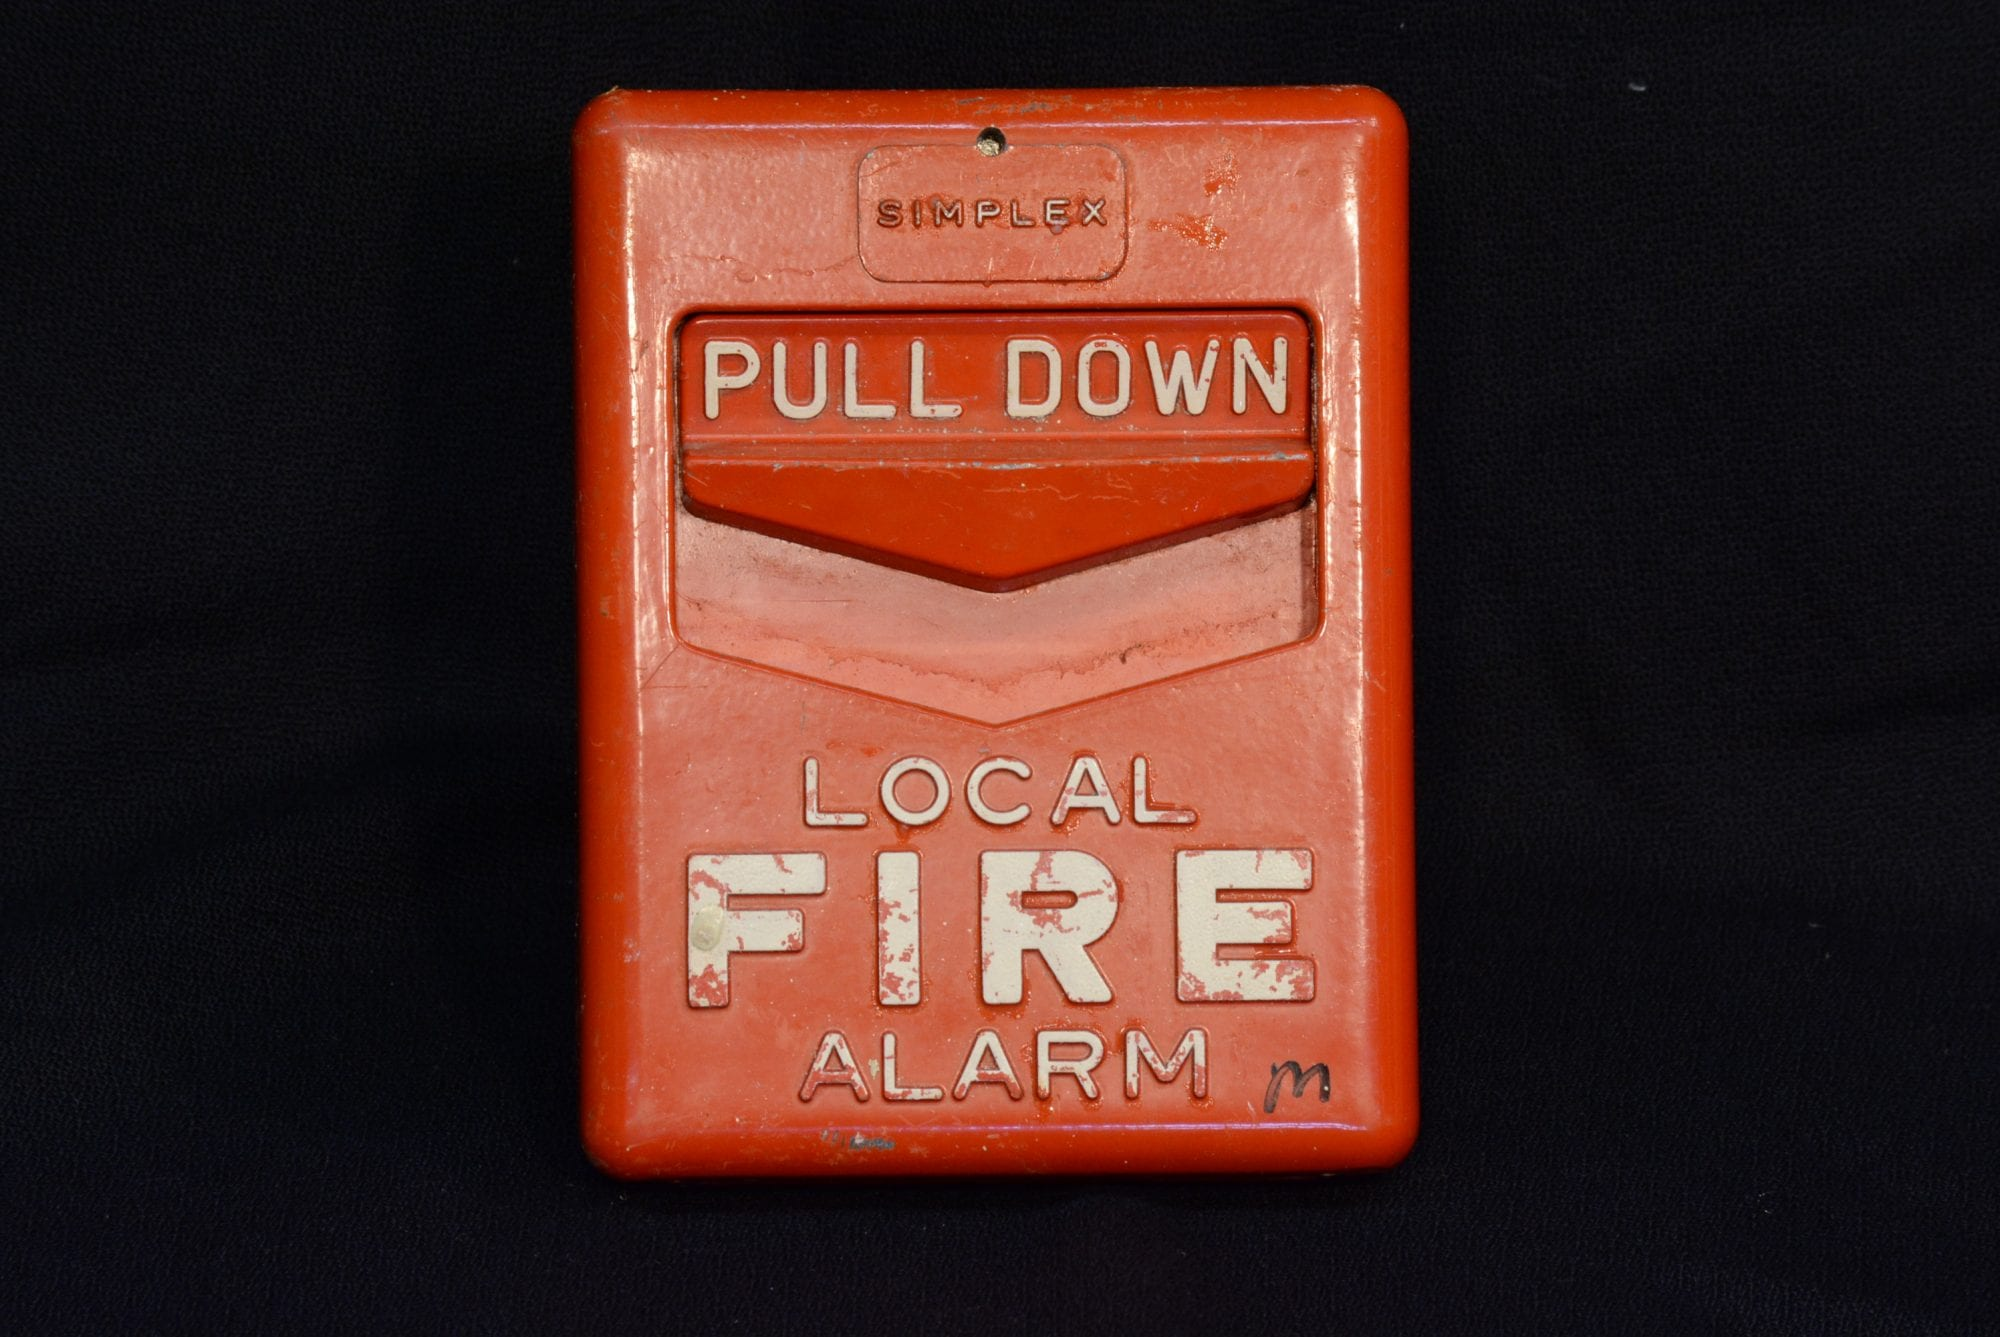 Local Manual Fire Alarm Station - Wayne Alarm Systems